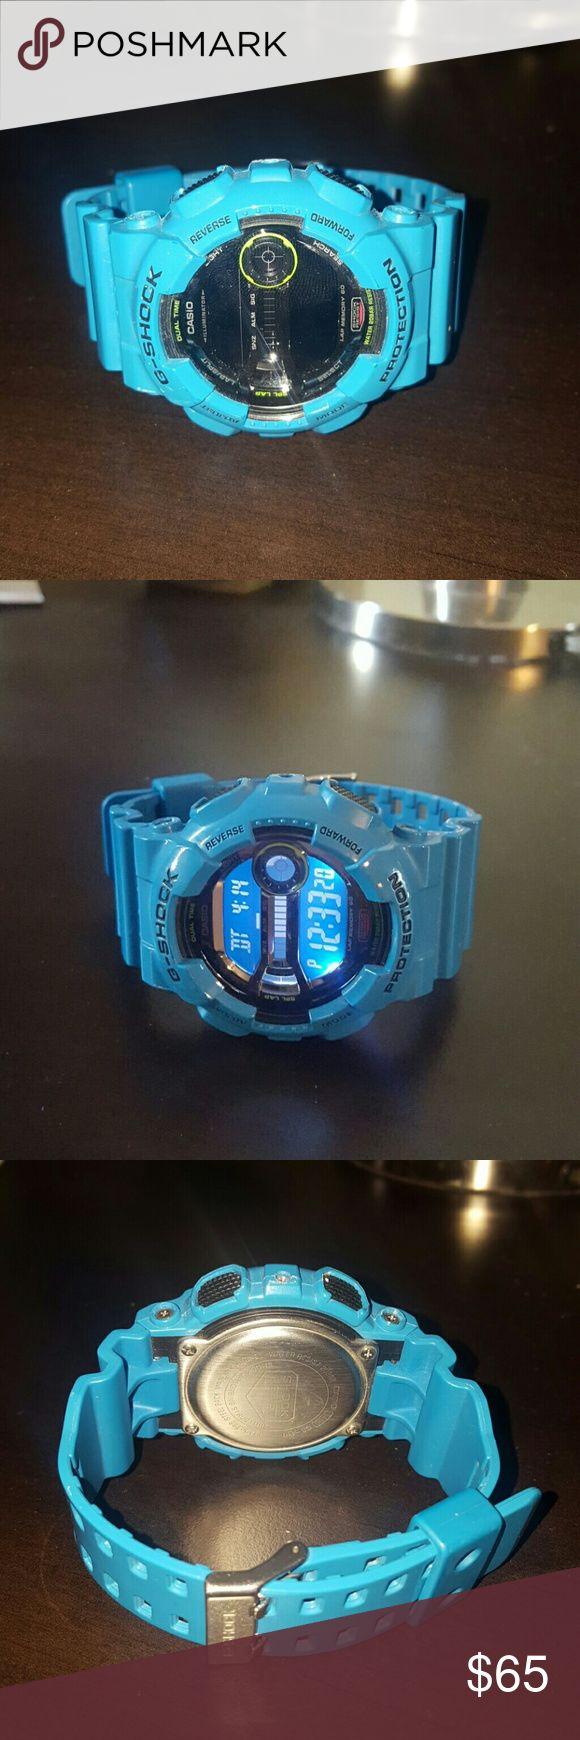 Blue Casio G-Shock Blue g shock. New, no scratches, works great. G-Shock Accessories Watches